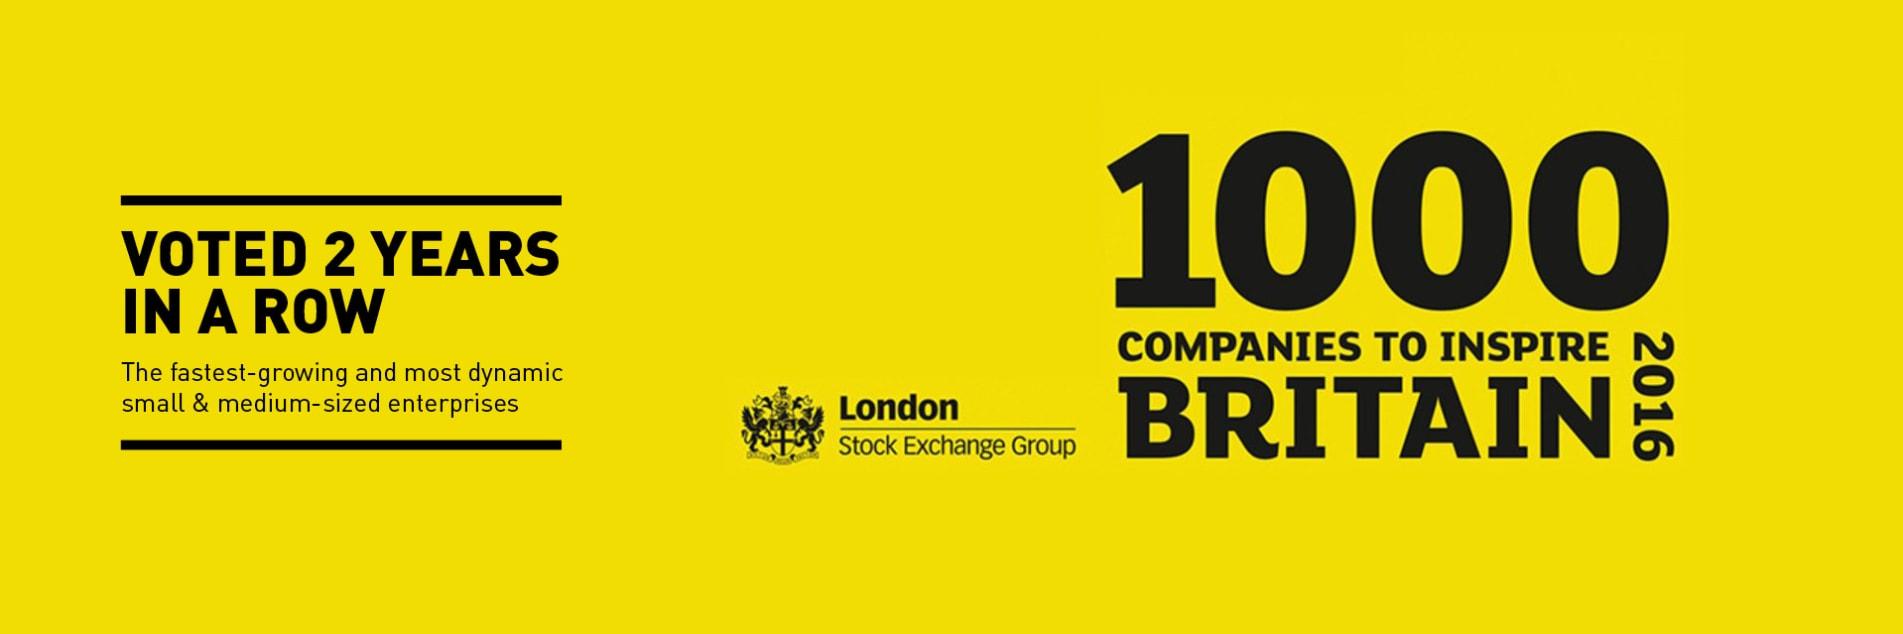 1000 companies to inspire